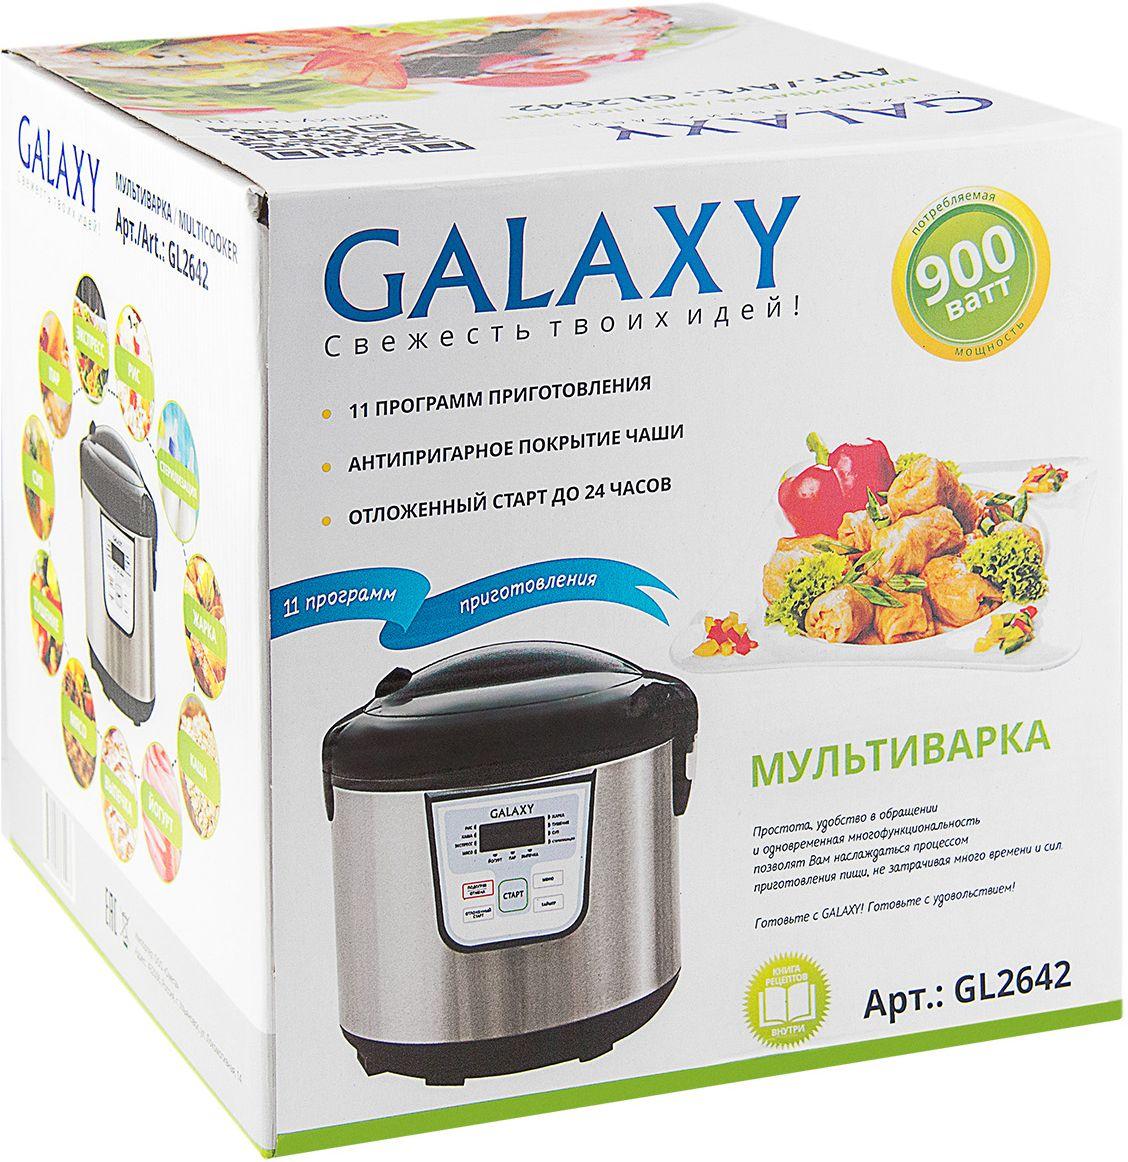 Мультиварка Galaxy GL 2642, Black Galaxy